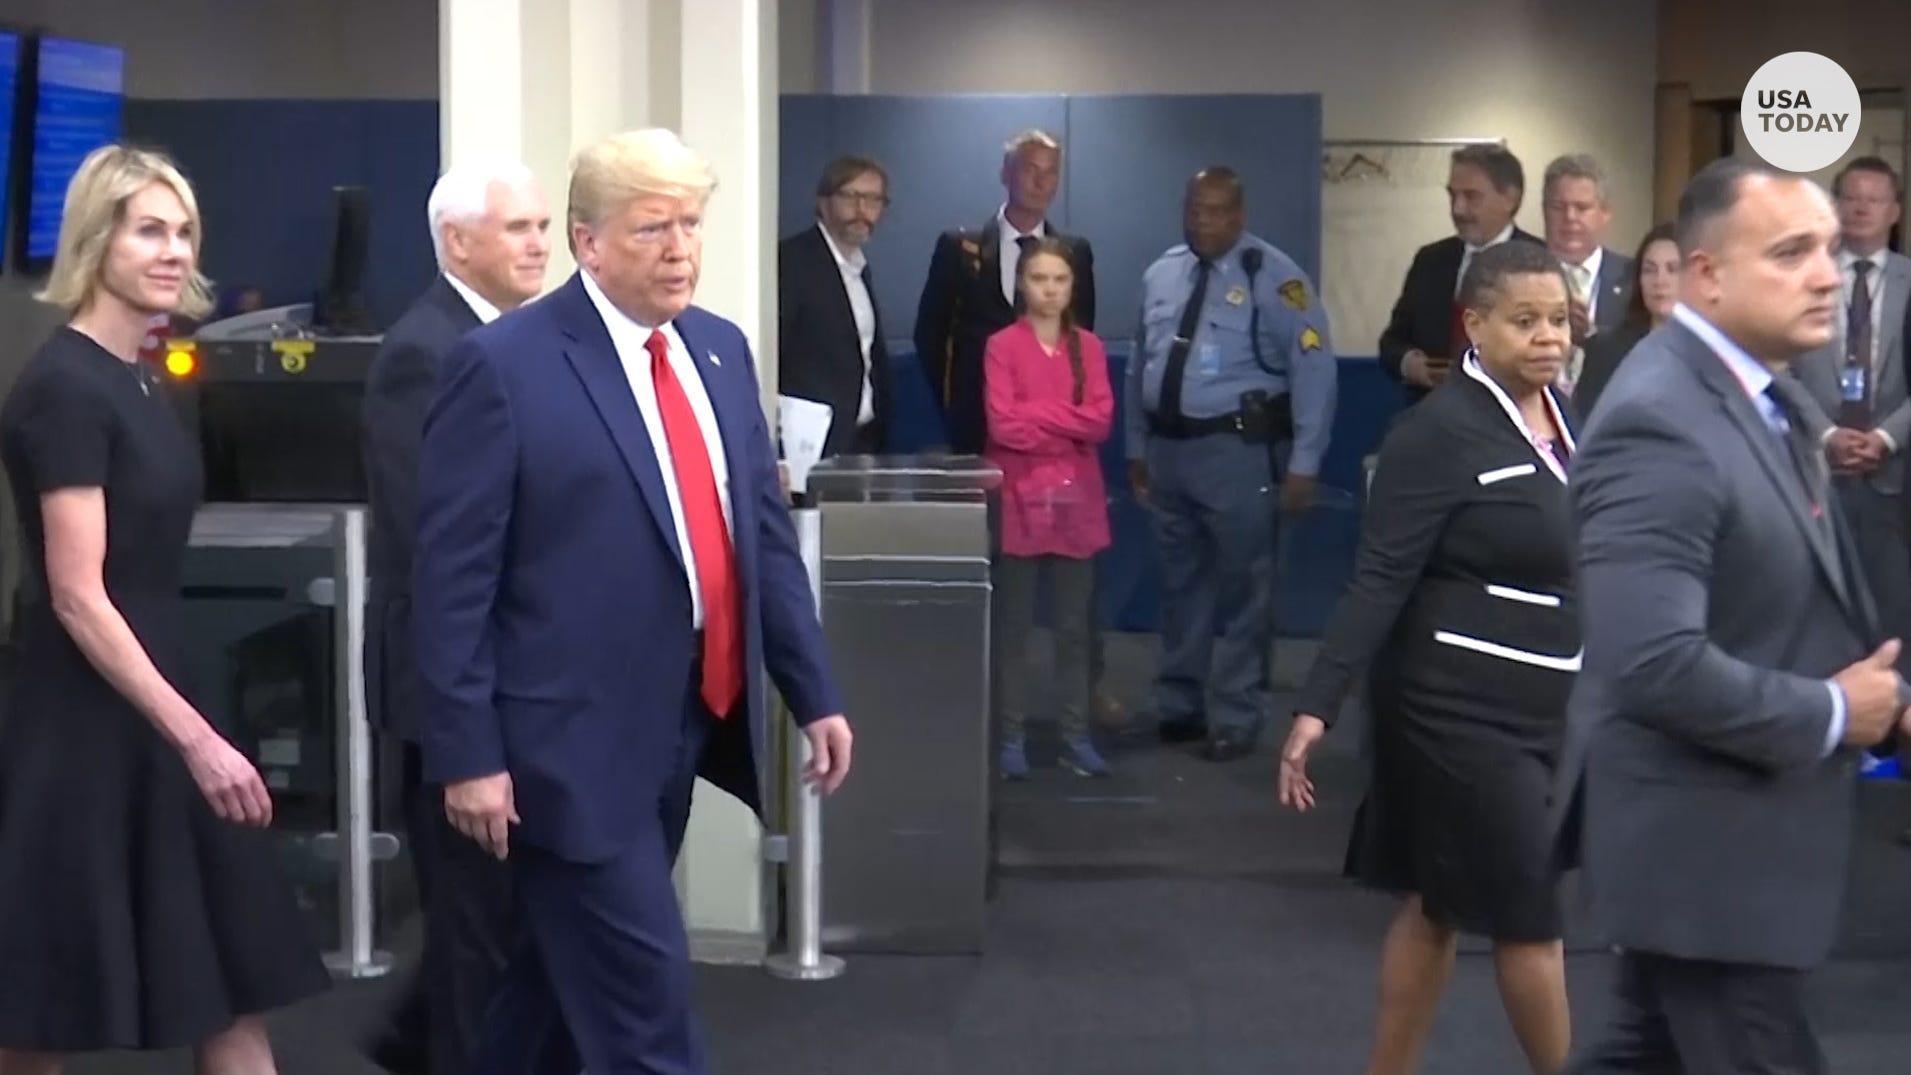 Davos chief welcomes Donald Trump, Greta Thunberg as climate change alarm tops agenda - USA TODAY